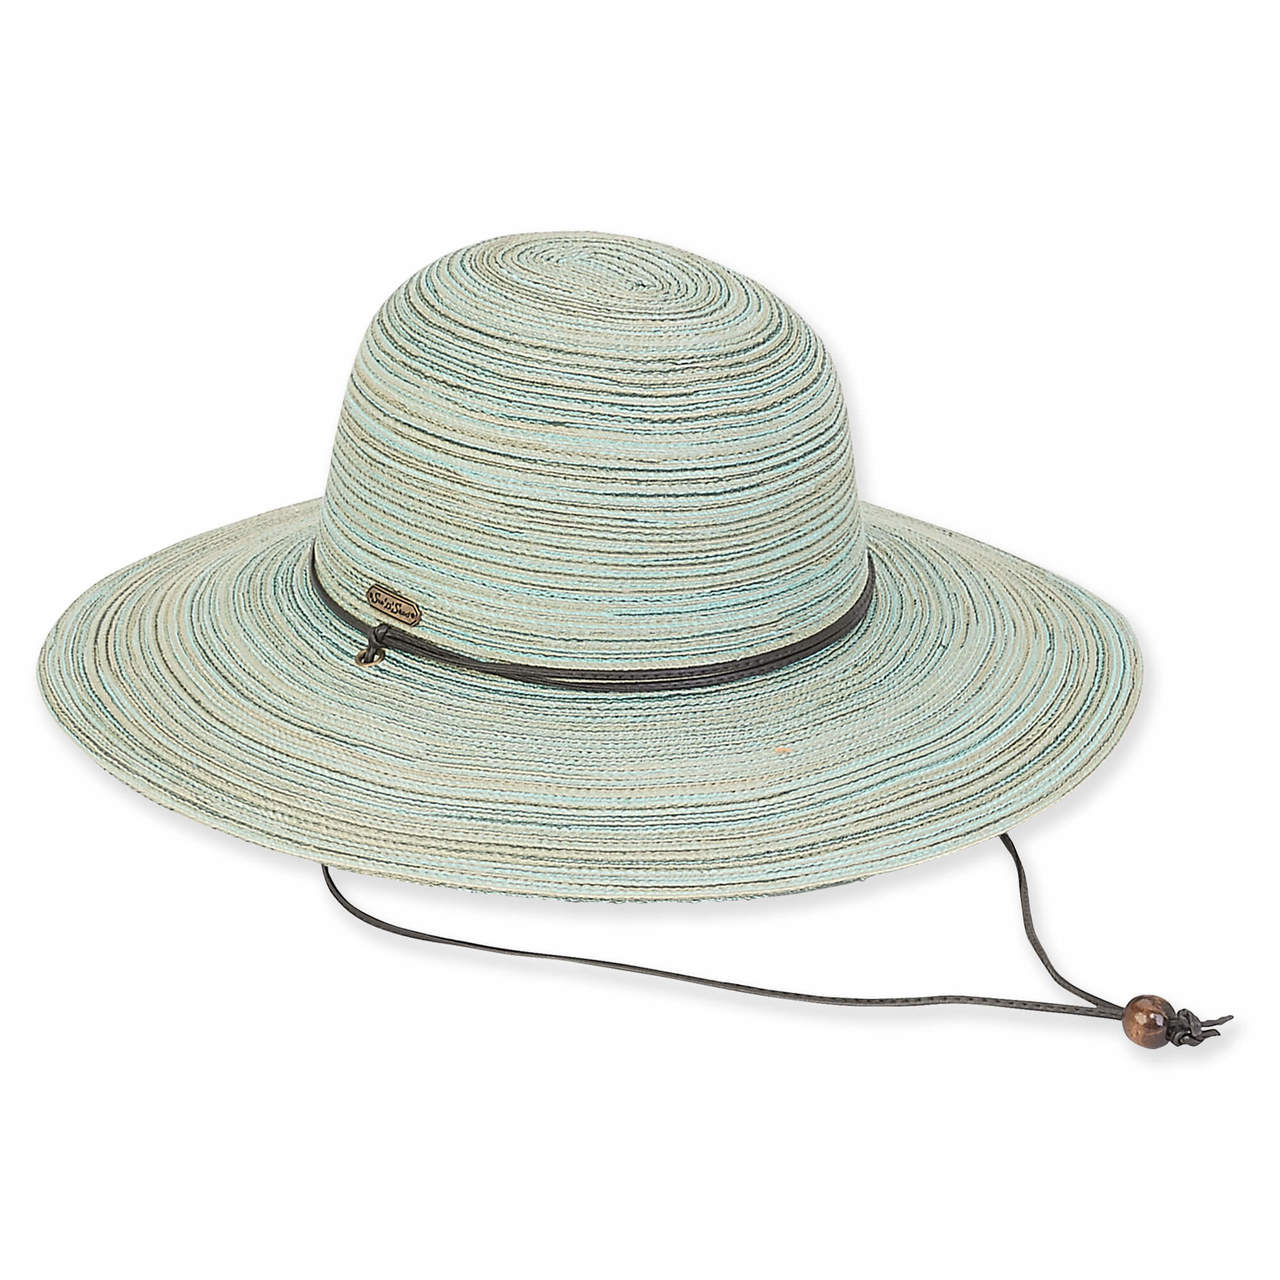 cbb0f9a6356 ... Sloane Braid Floppy Hat - Green ...